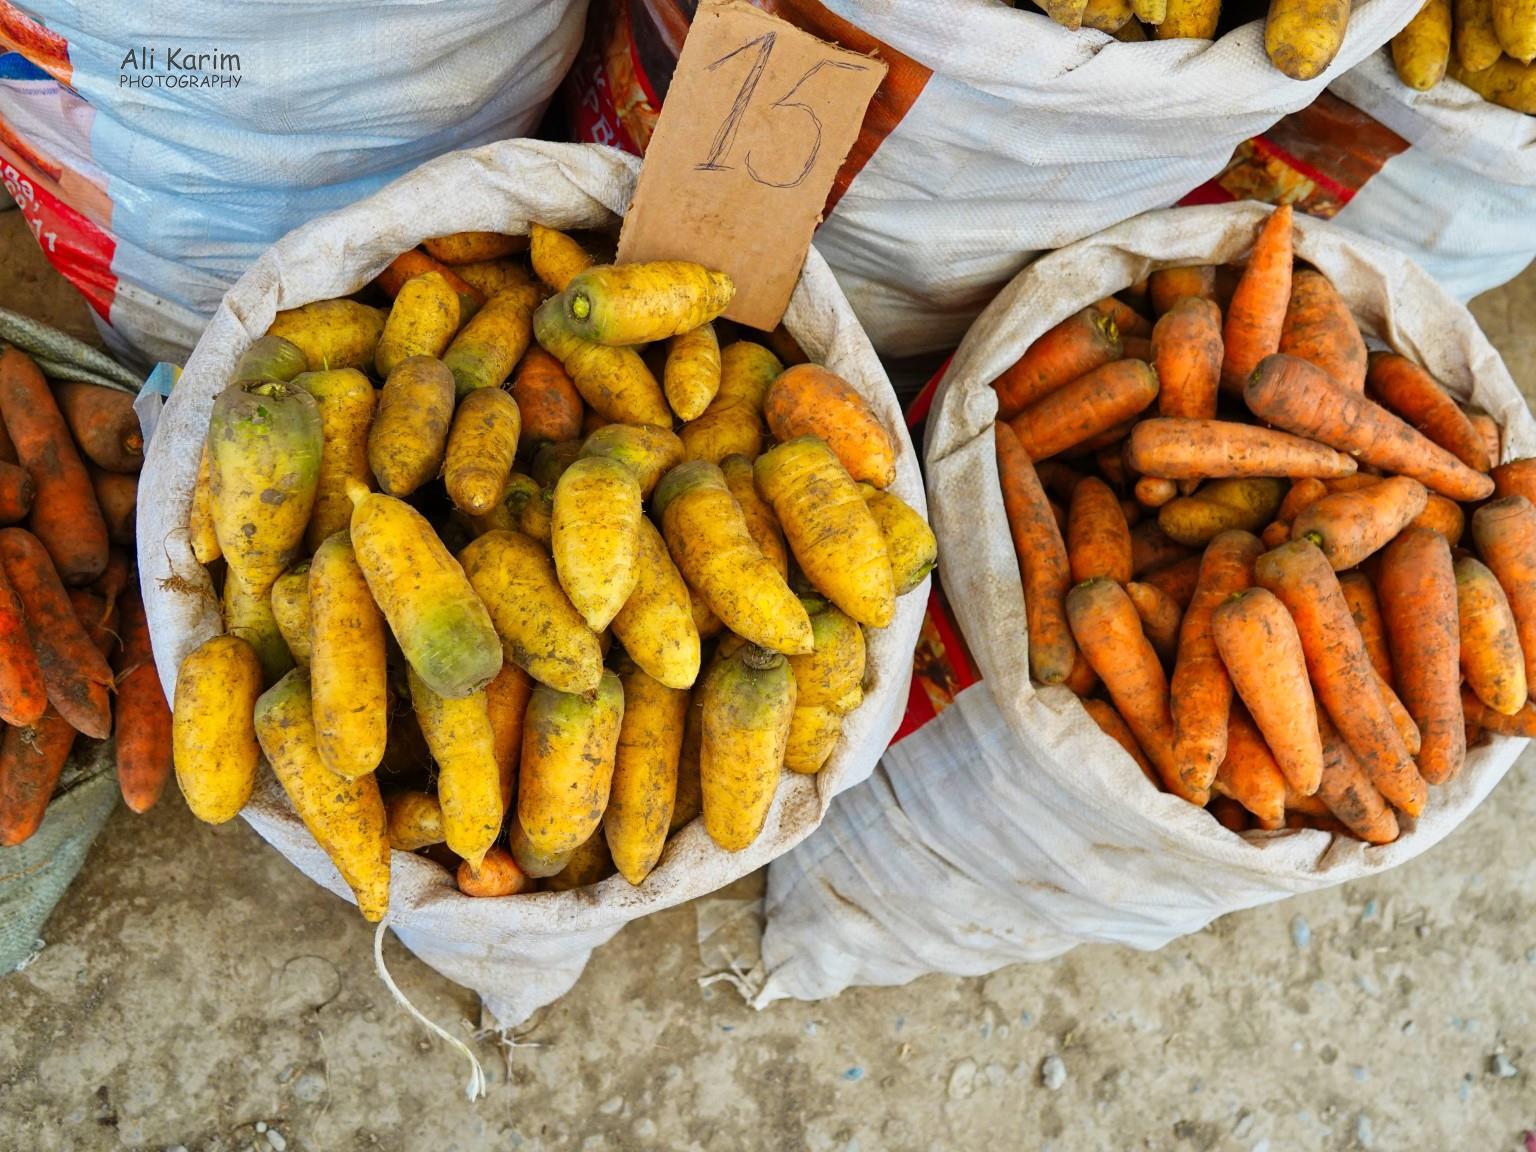 Silk Road 15: Osh, Kyrgyzstan Orange and Yellow Carrots